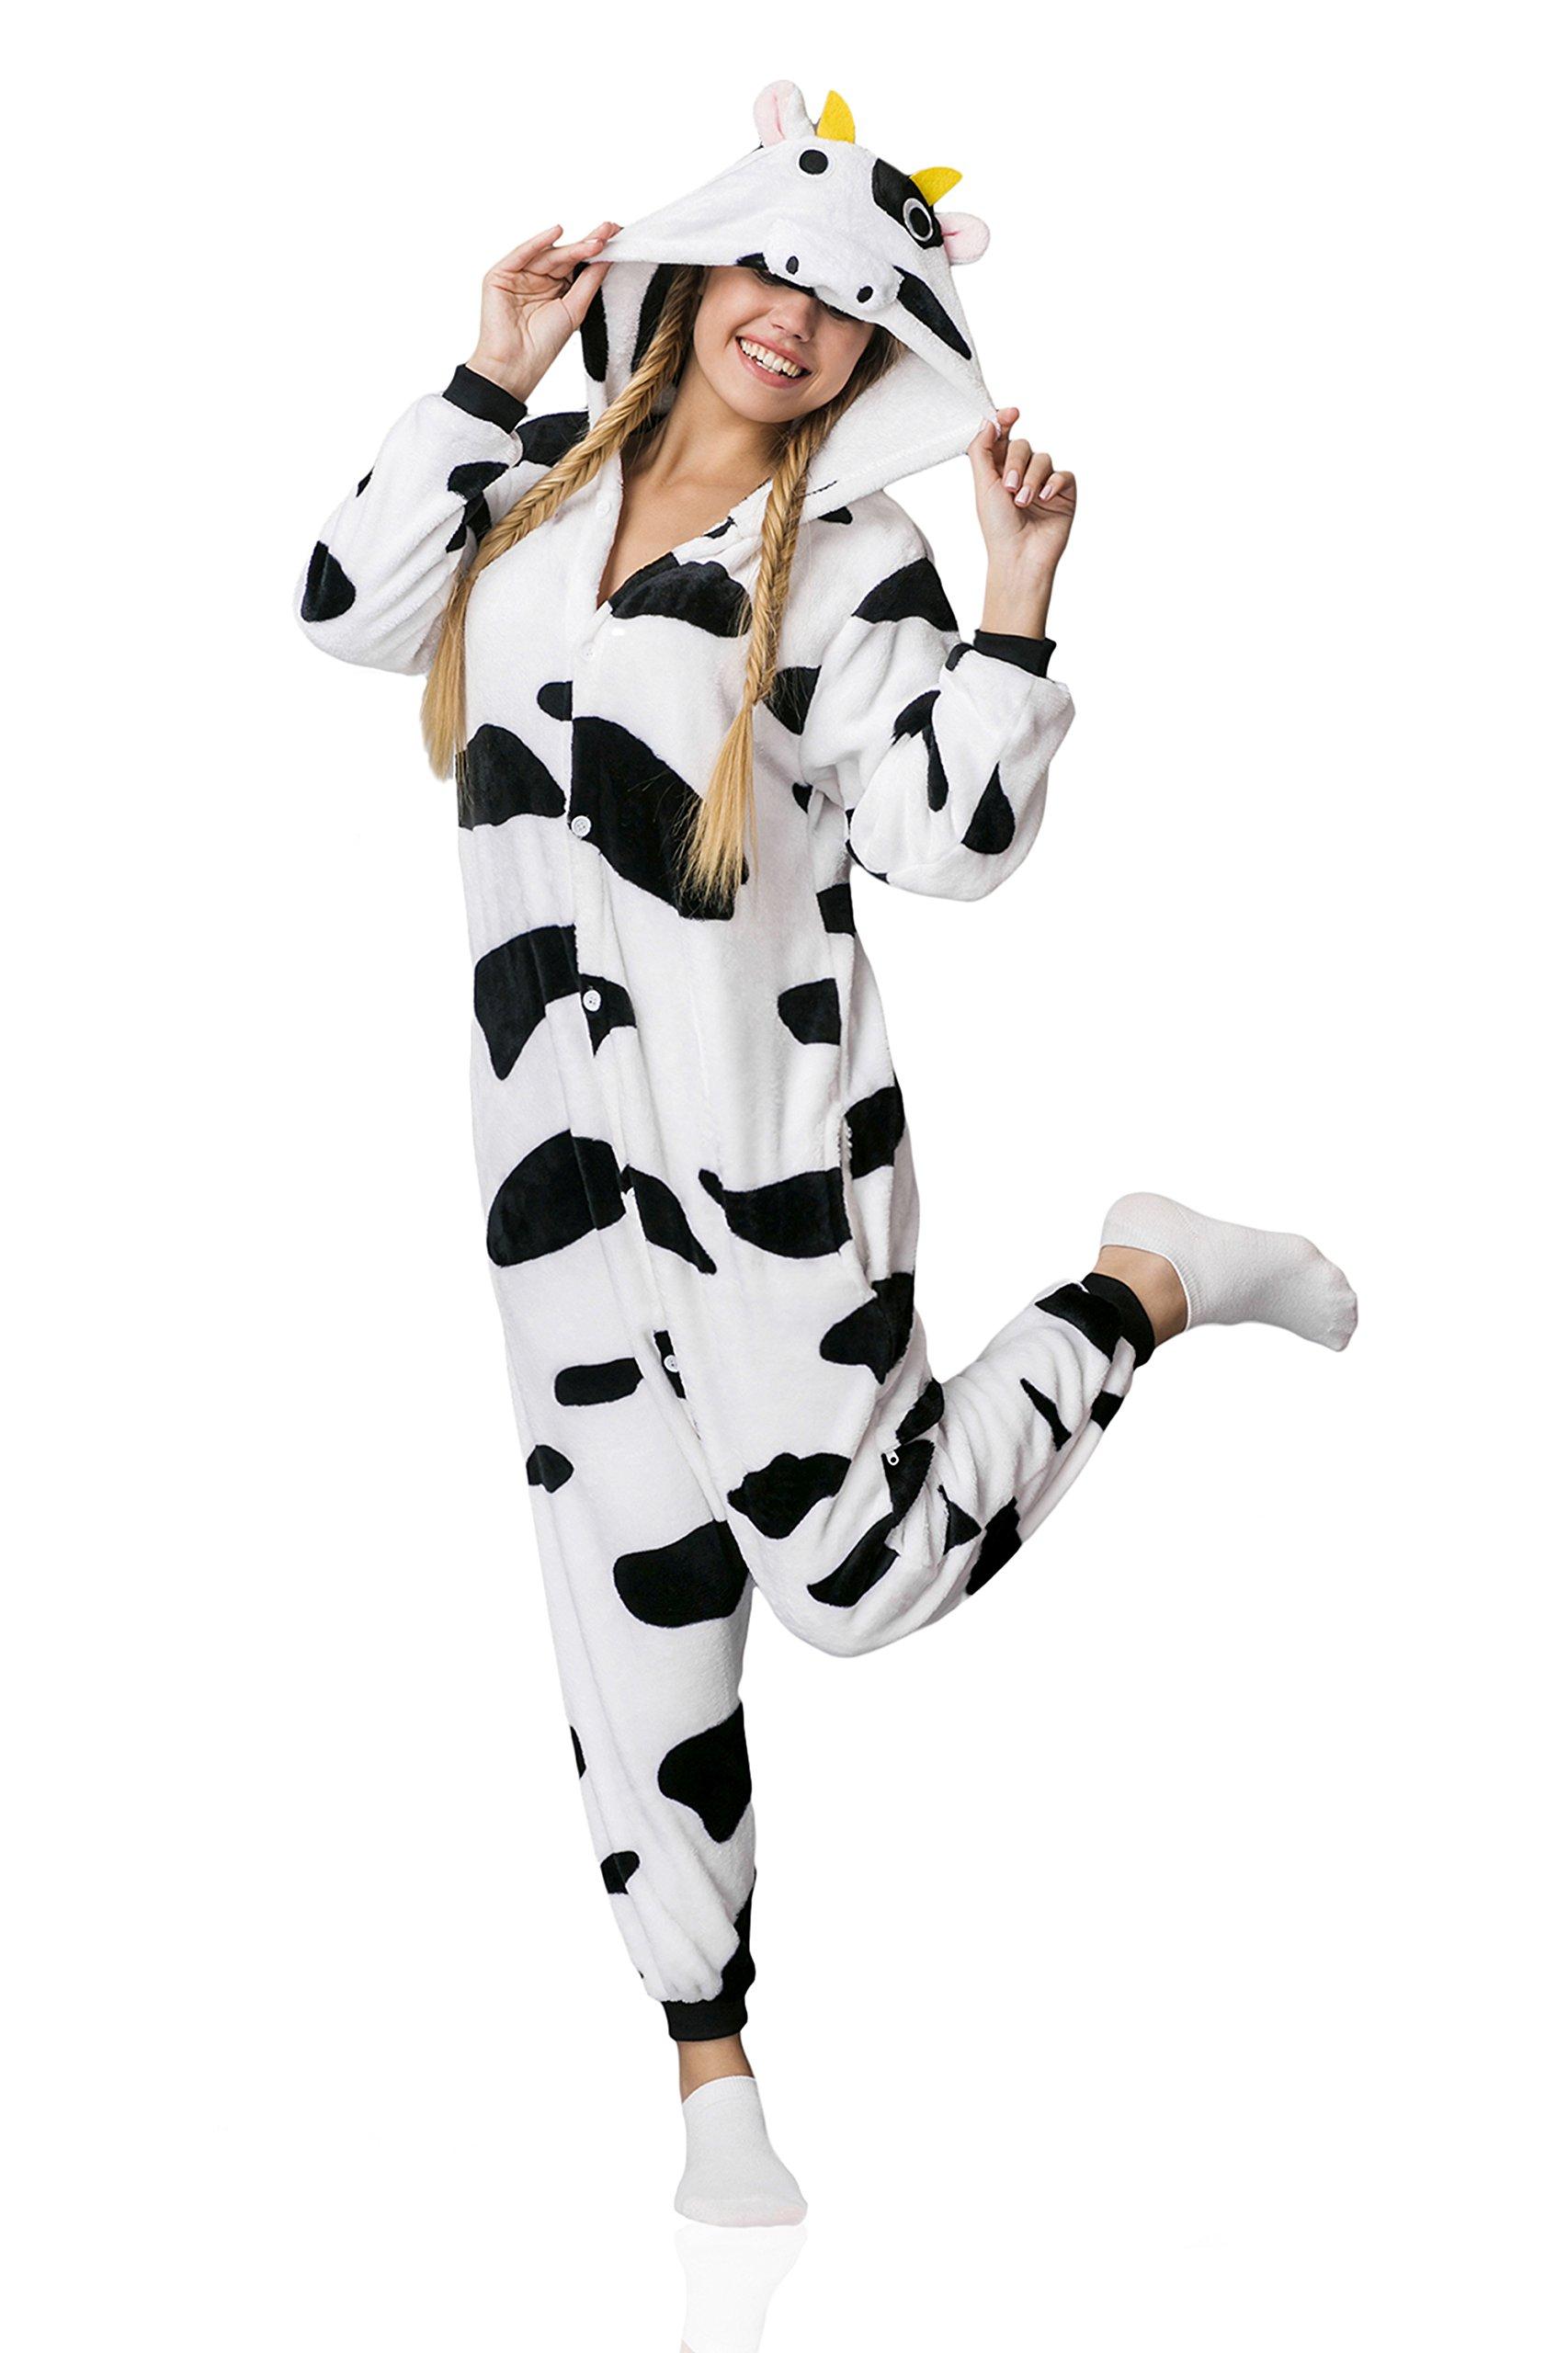 Nothing But Love Adult Cow Kigurumi Onesie Pajamas Costume Hooded Warm Fleece Pjs (Medium, White/Black/Cow Print) by Nothing But Love (Image #1)